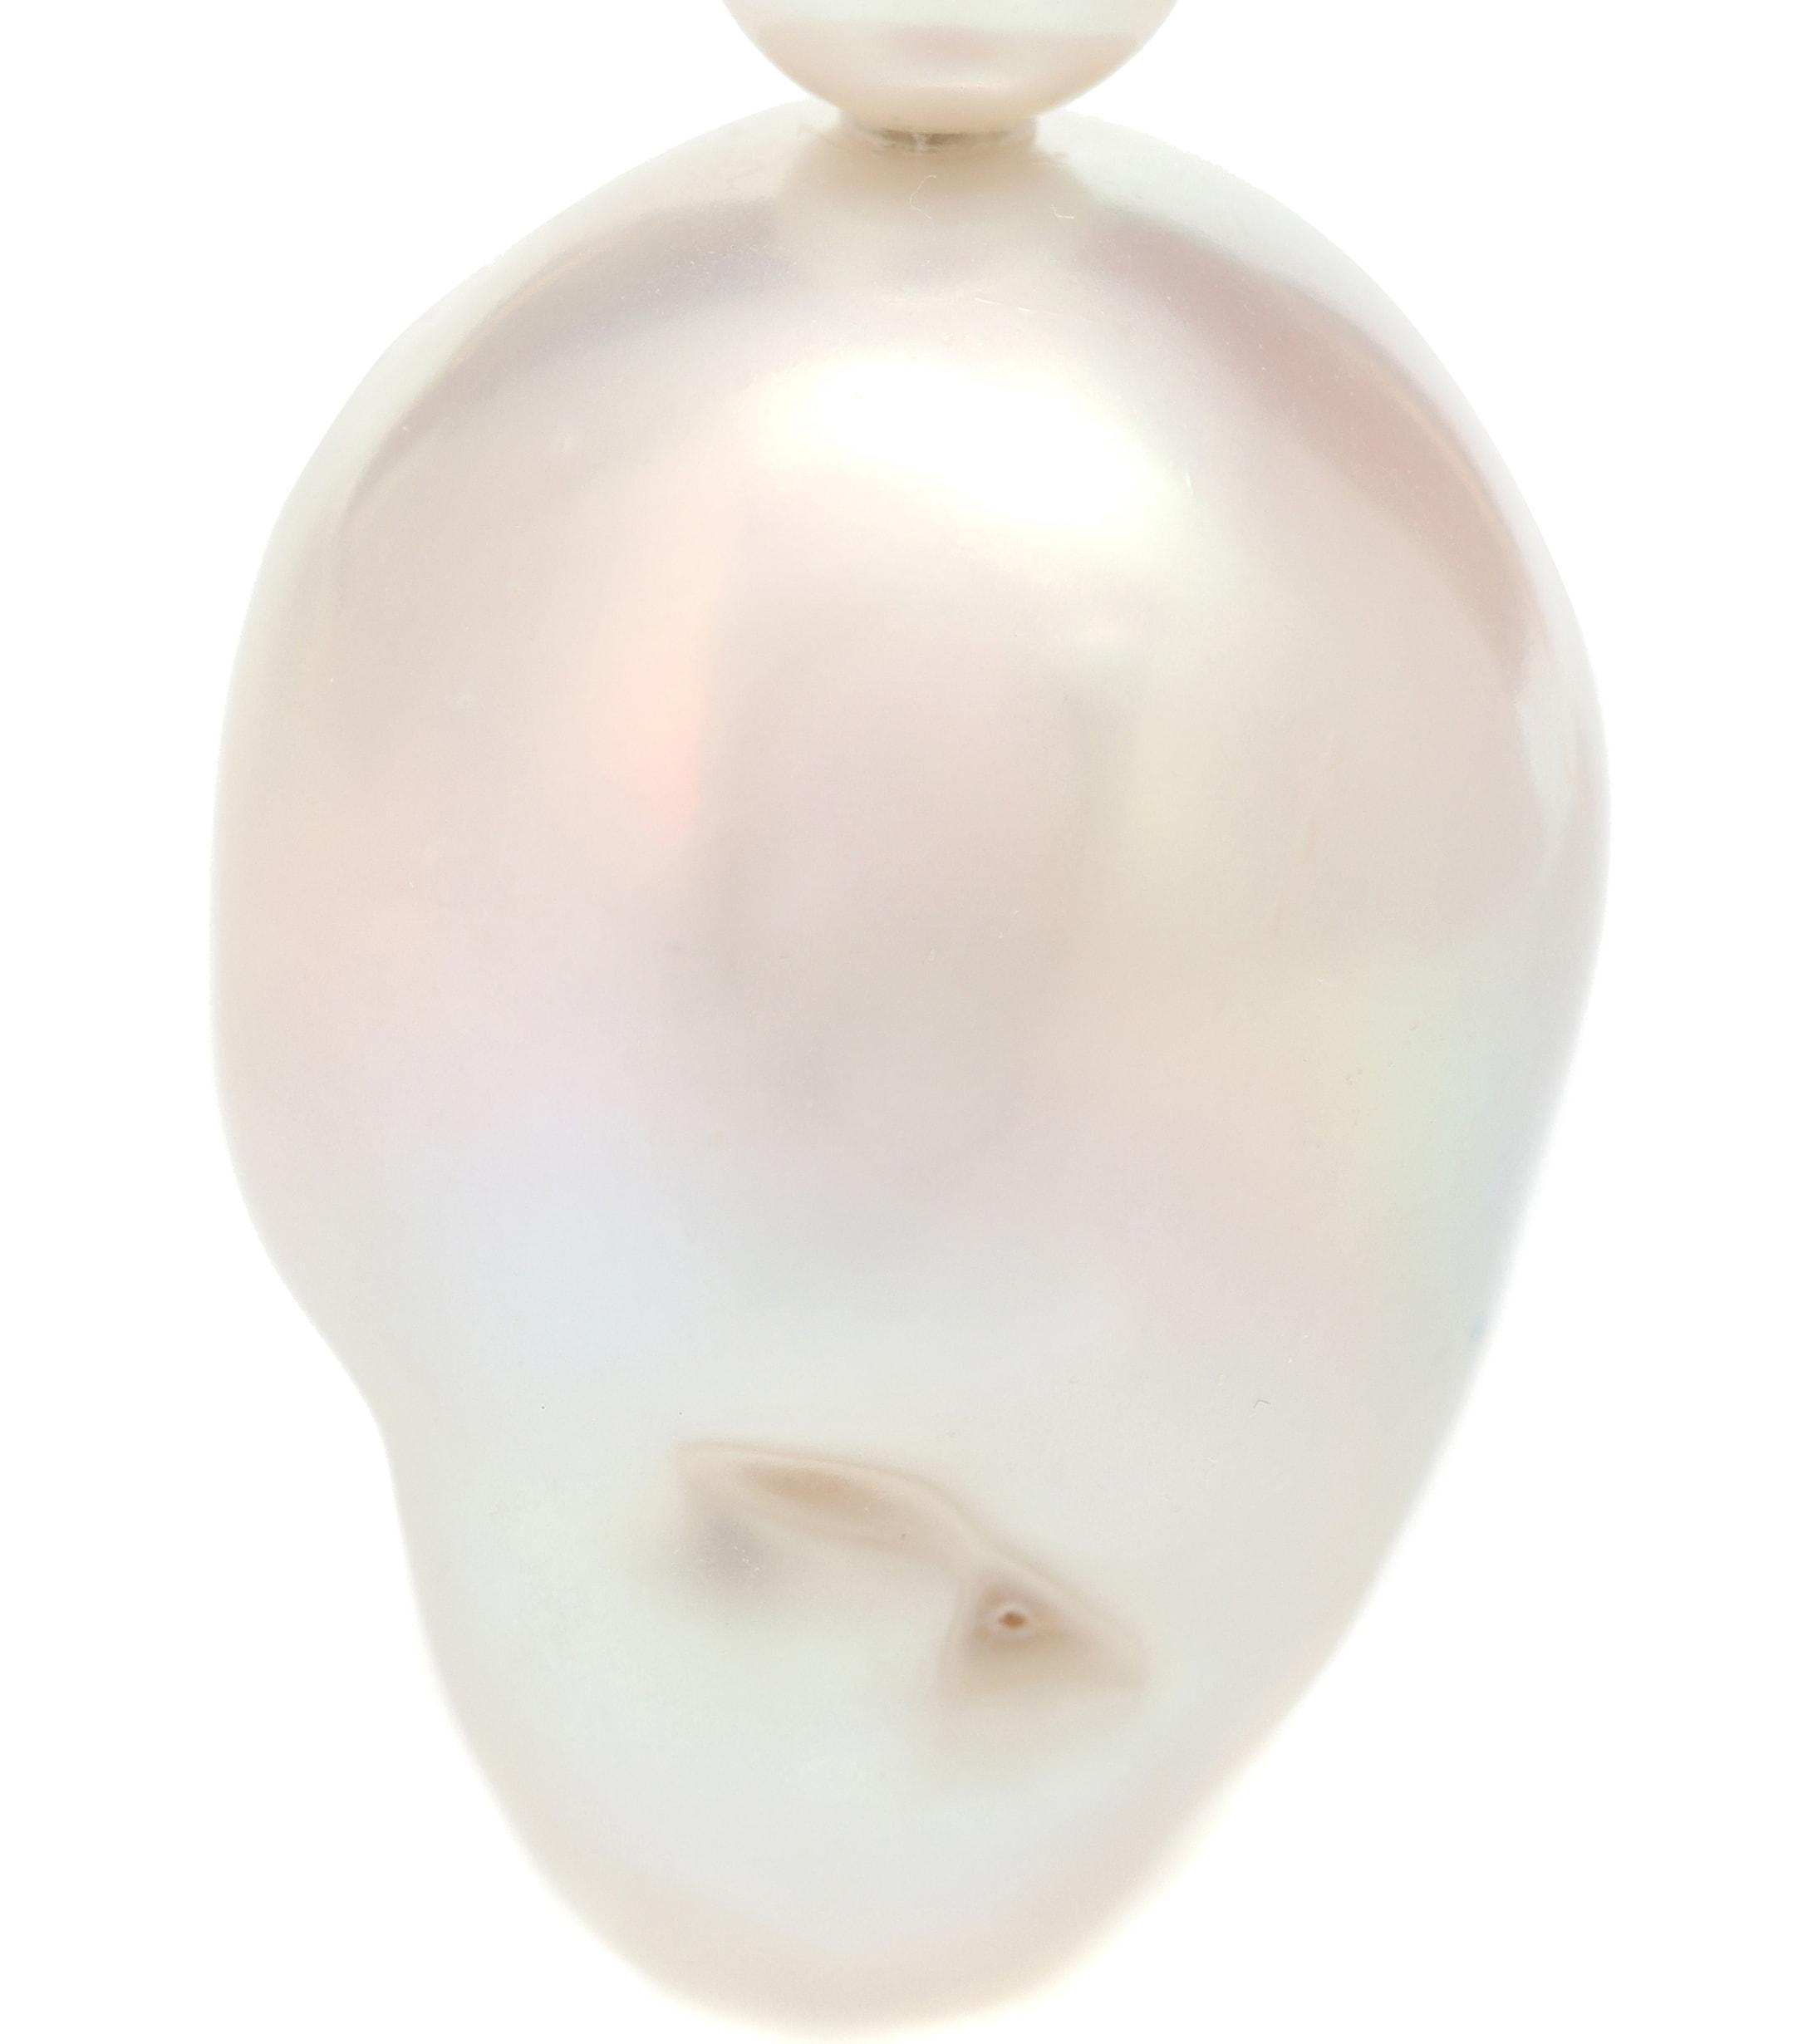 dd44c8e752b7 Arete único Venus de oro de 14 ct con perlas Sophie Bille Brahe de ...